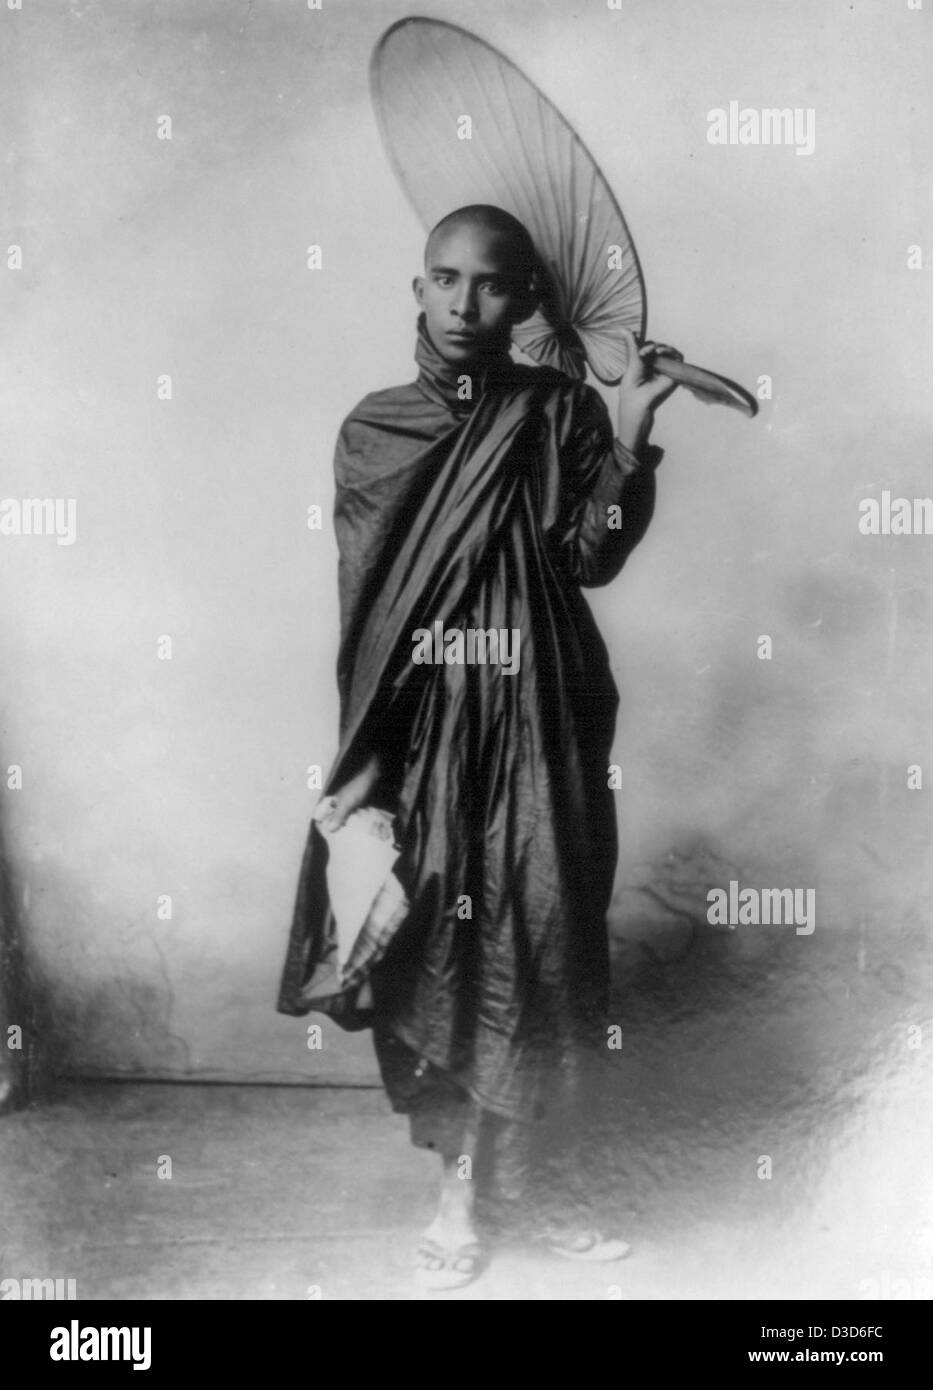 Un moine birman, vers 1890 Photo Stock